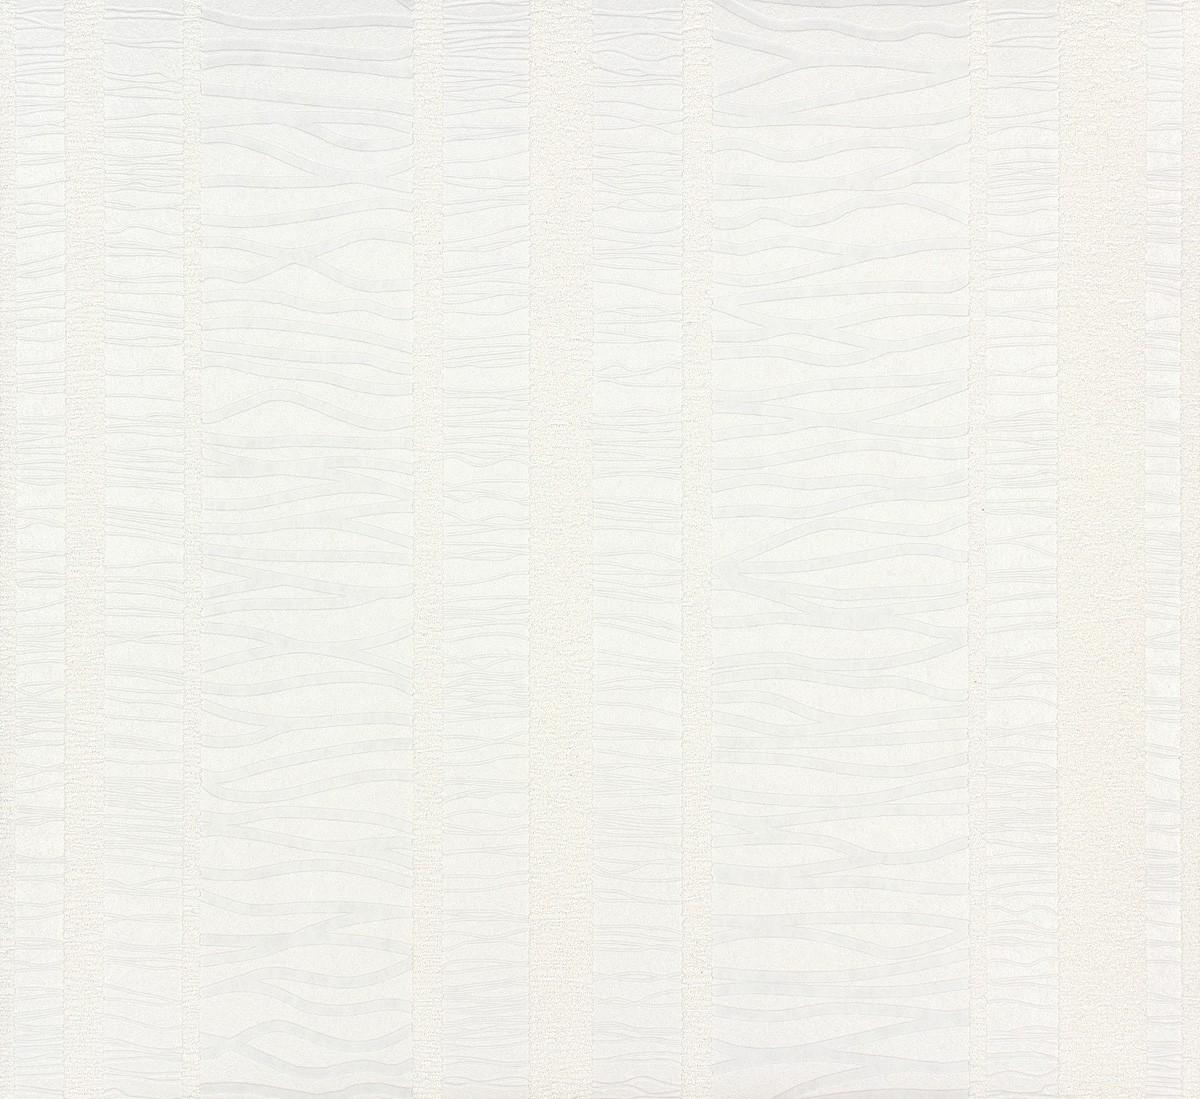 vliestapete berstreichbar streifen wei patent decor 3d 9457. Black Bedroom Furniture Sets. Home Design Ideas